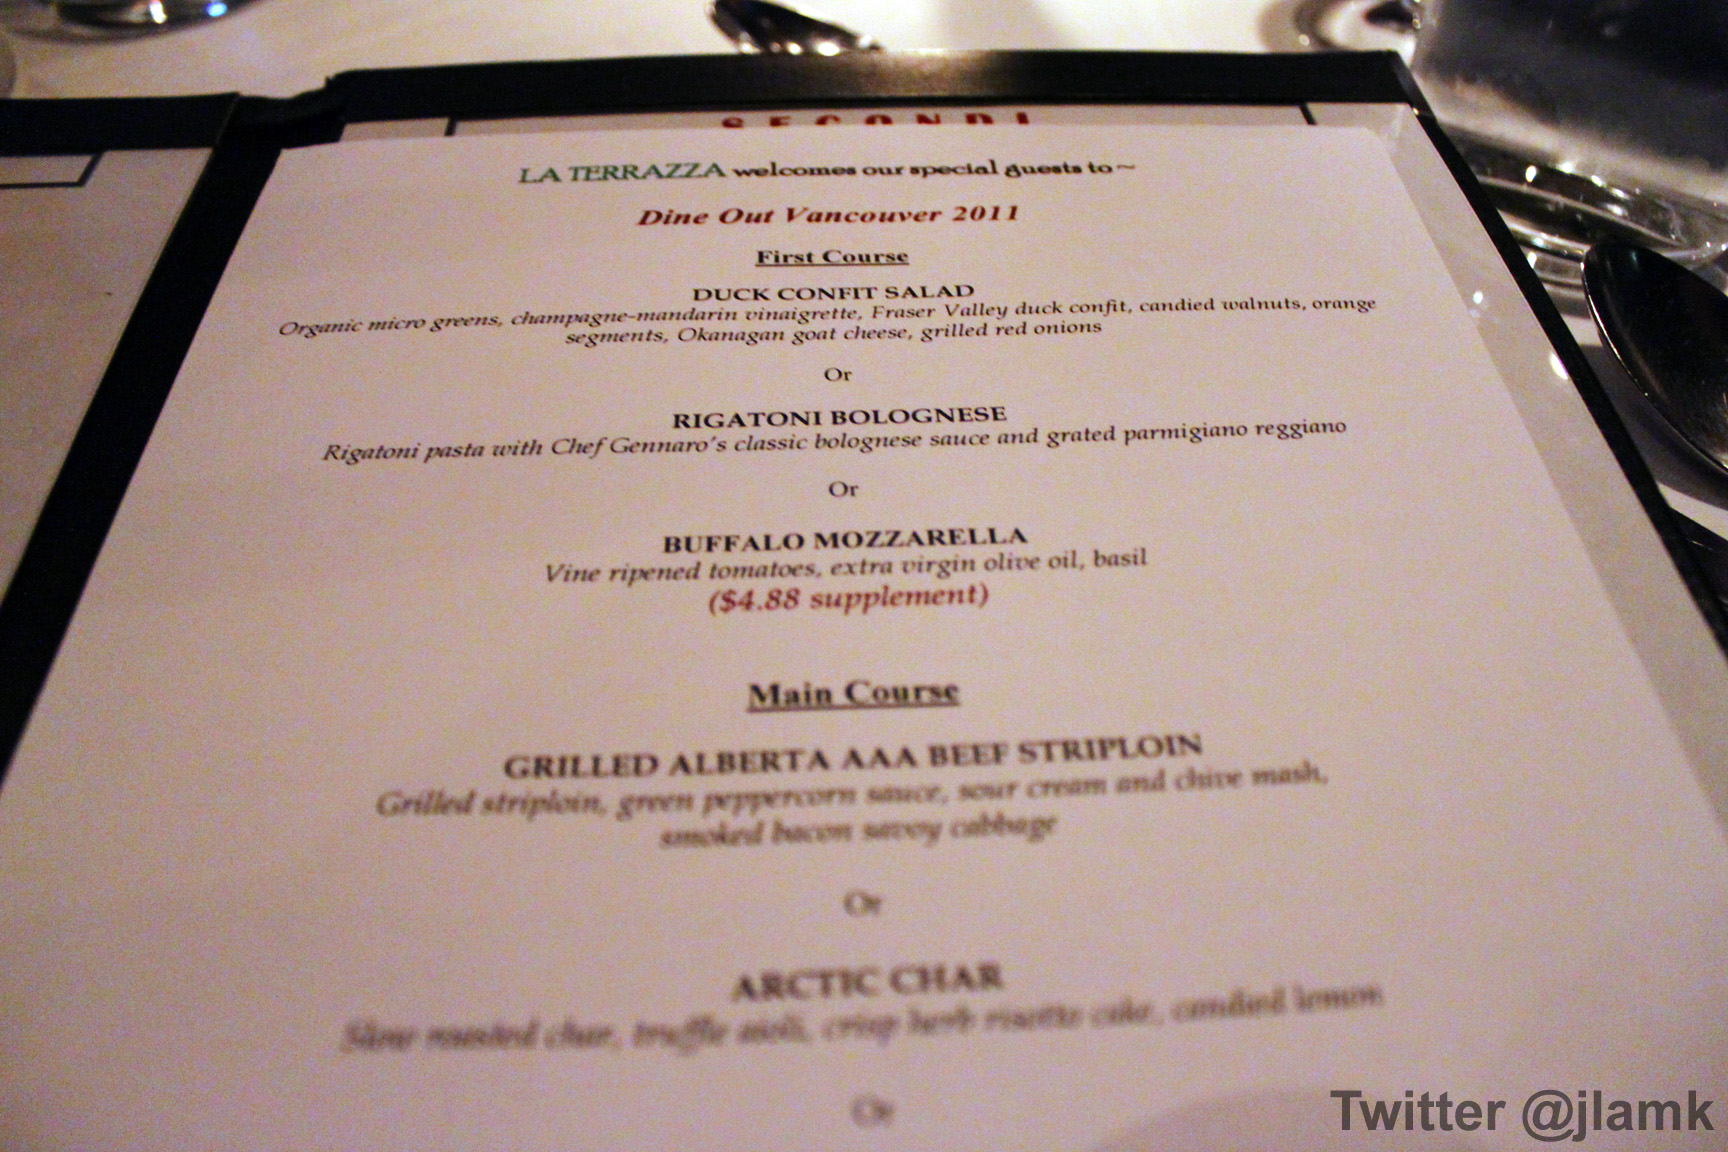 La Terrazza Dine Out Menu | VanFoodies.com